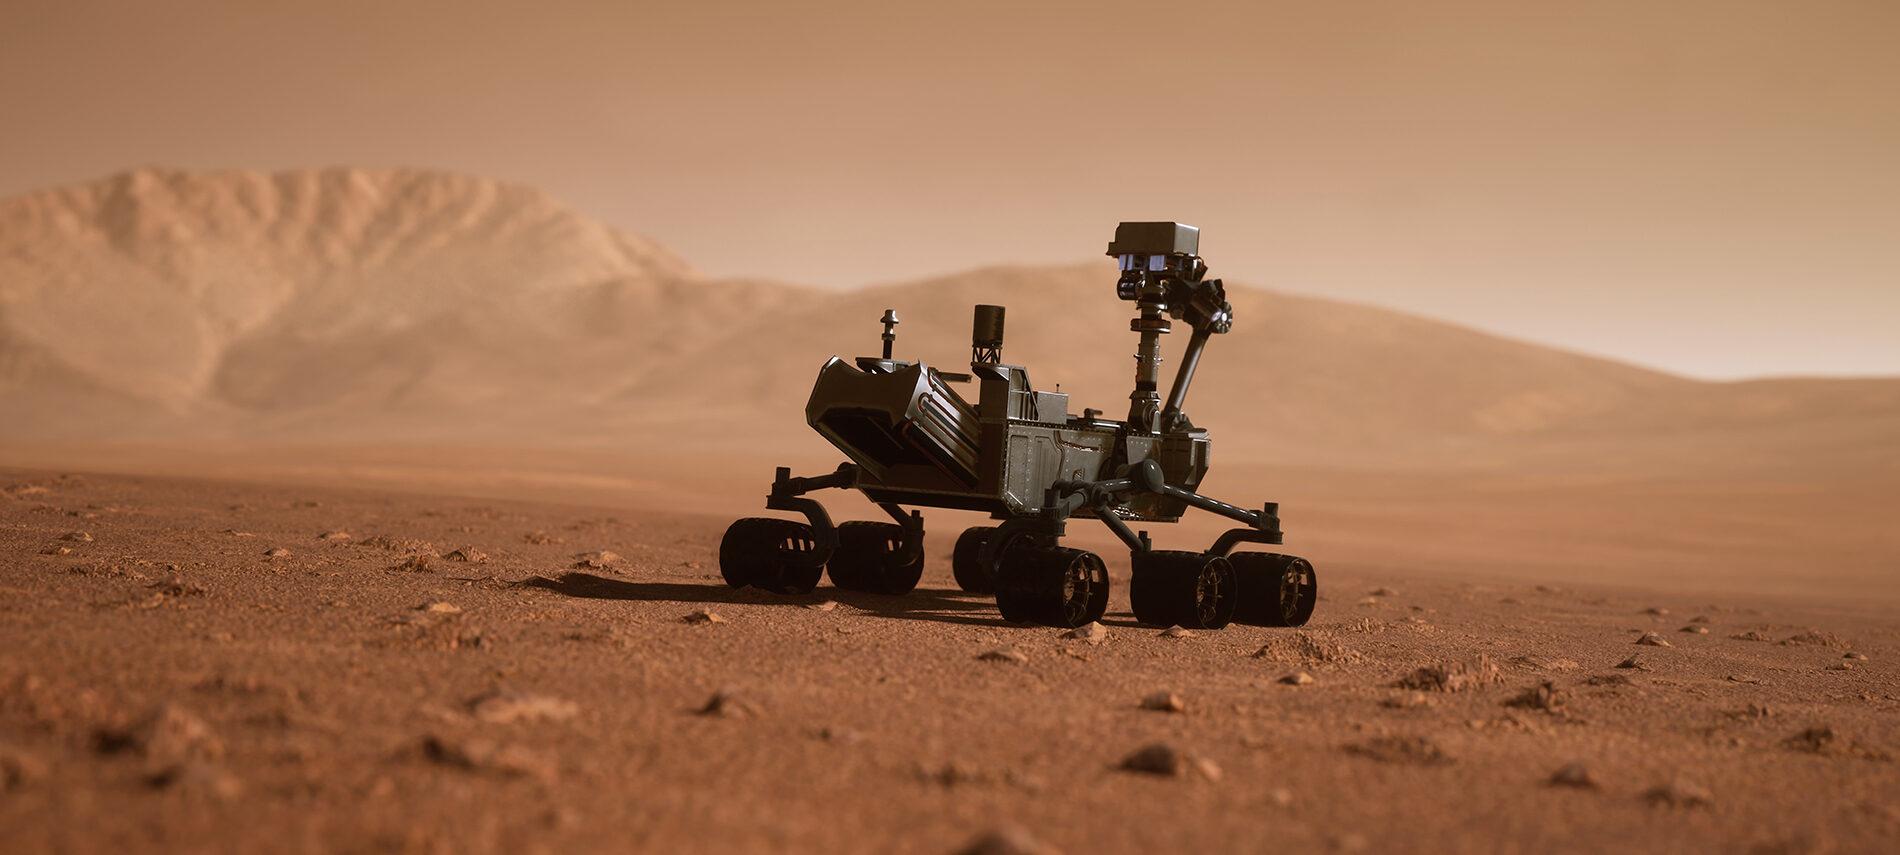 Foto Roboter in der Wüste